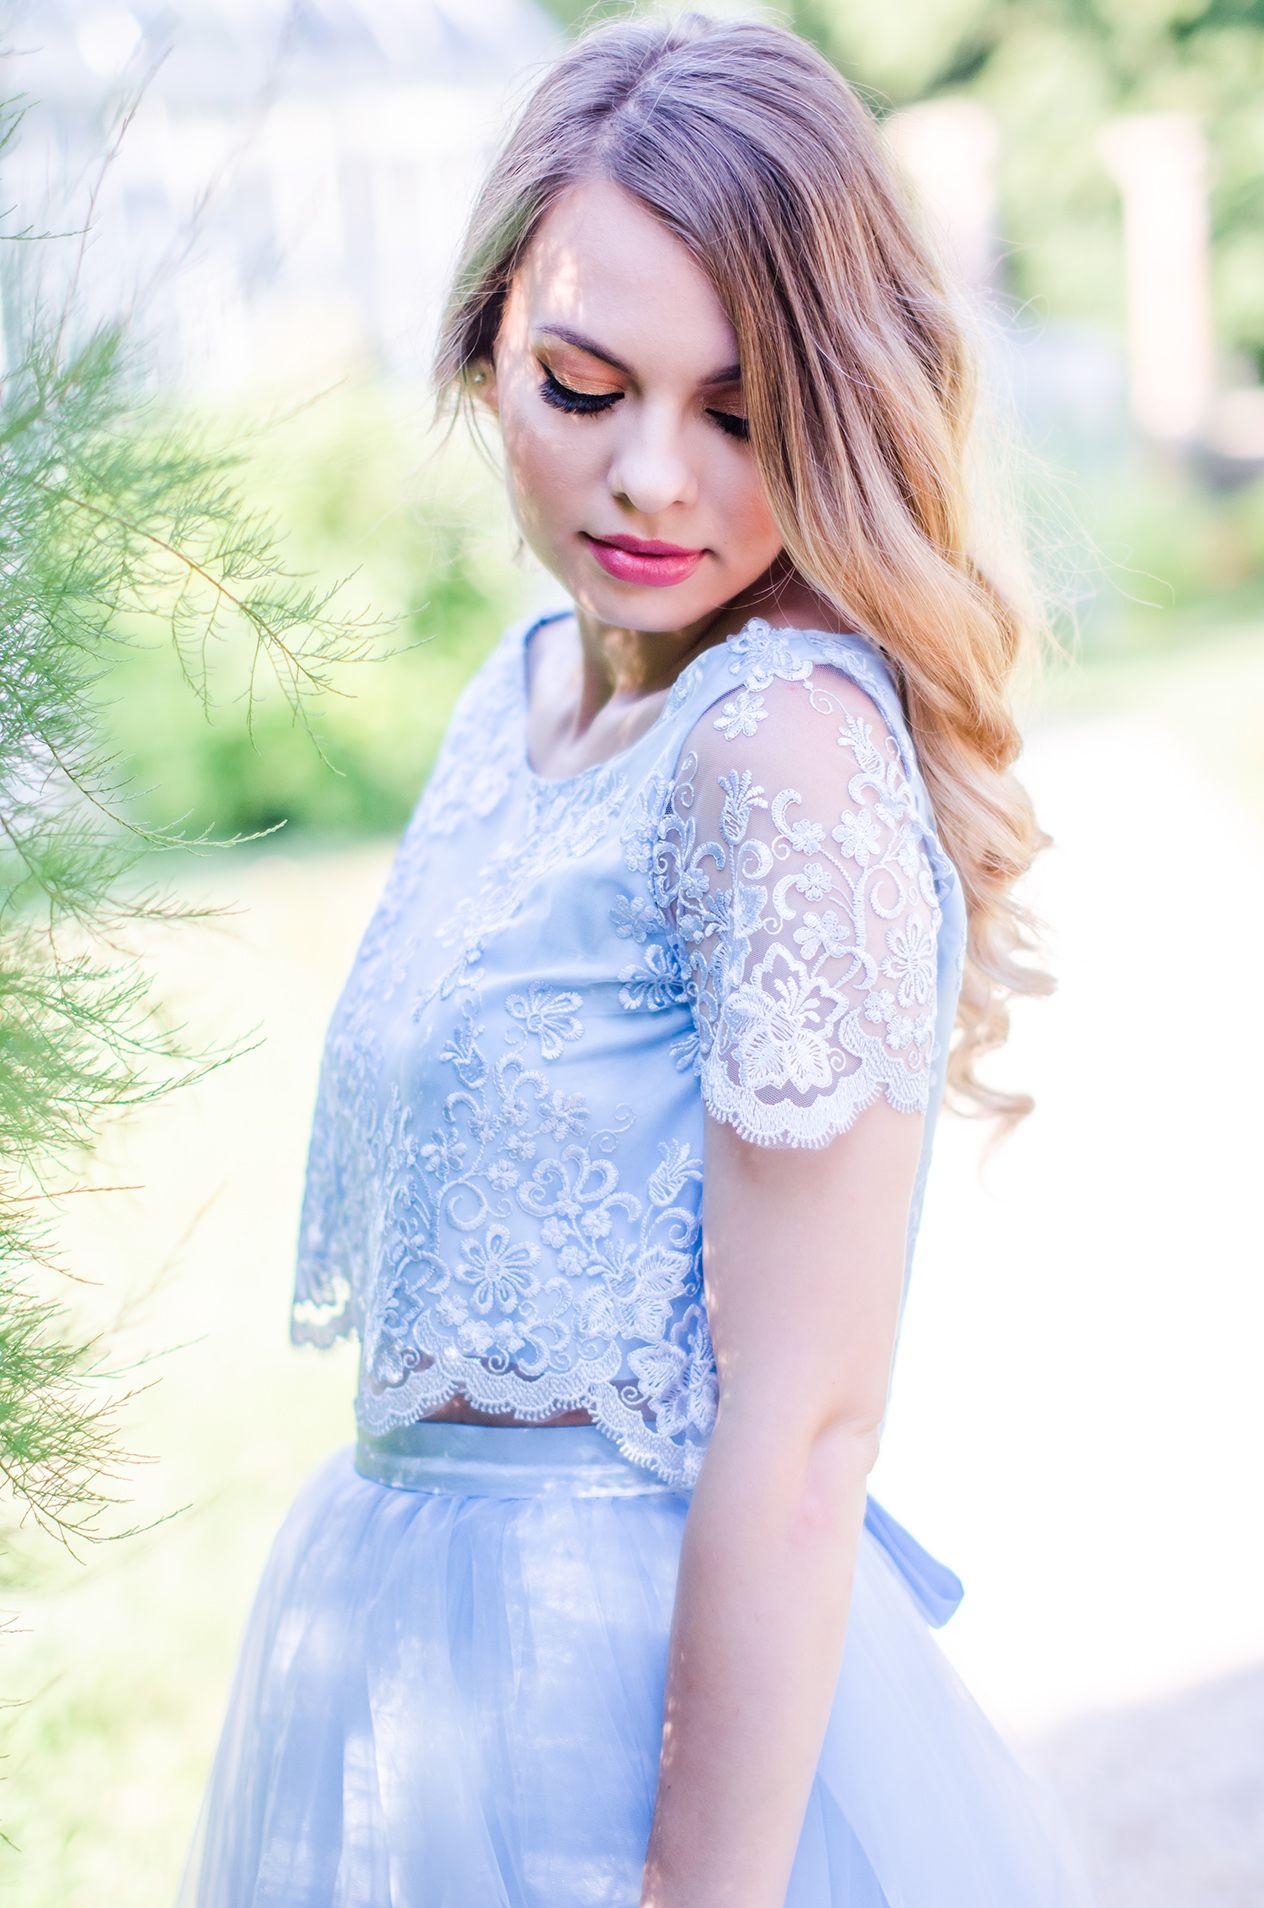 36+ Pink lace wedding dress topper ideas in 2021